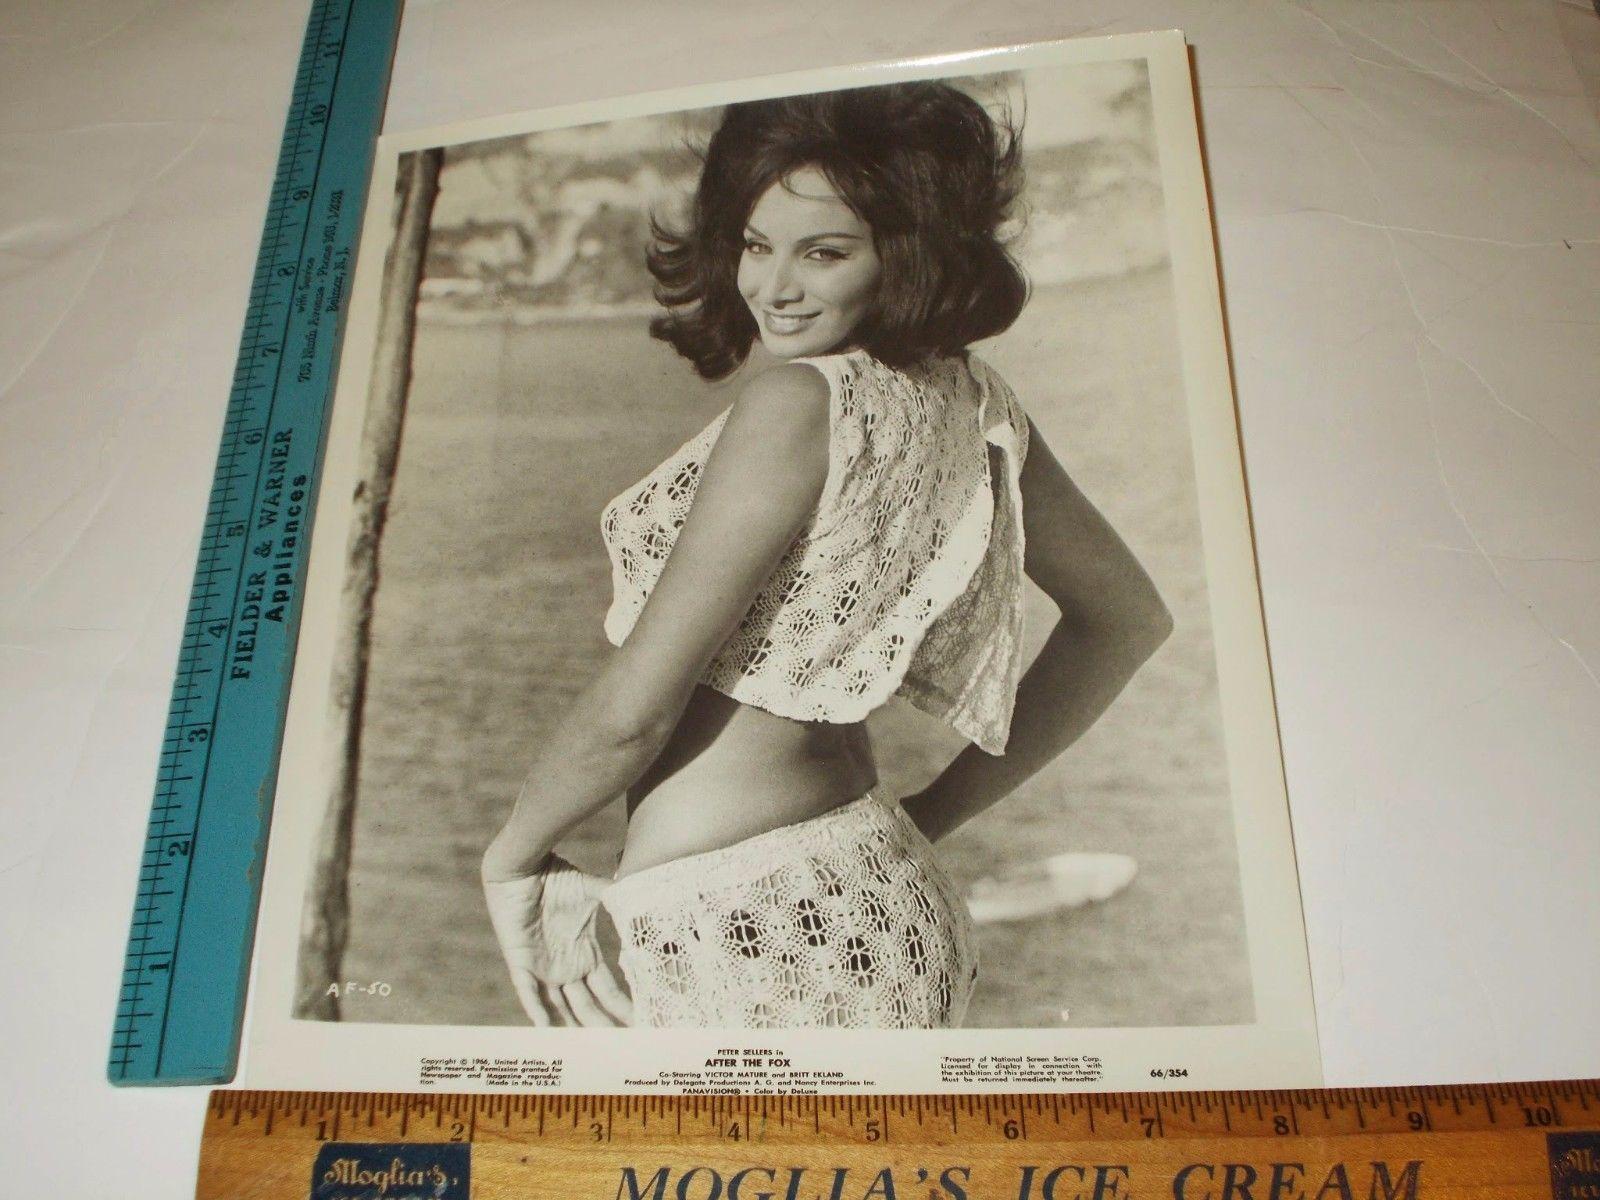 Discussion on this topic: Ruthie Henshall (born 1967), maria-grazia-buccella-born-1940/